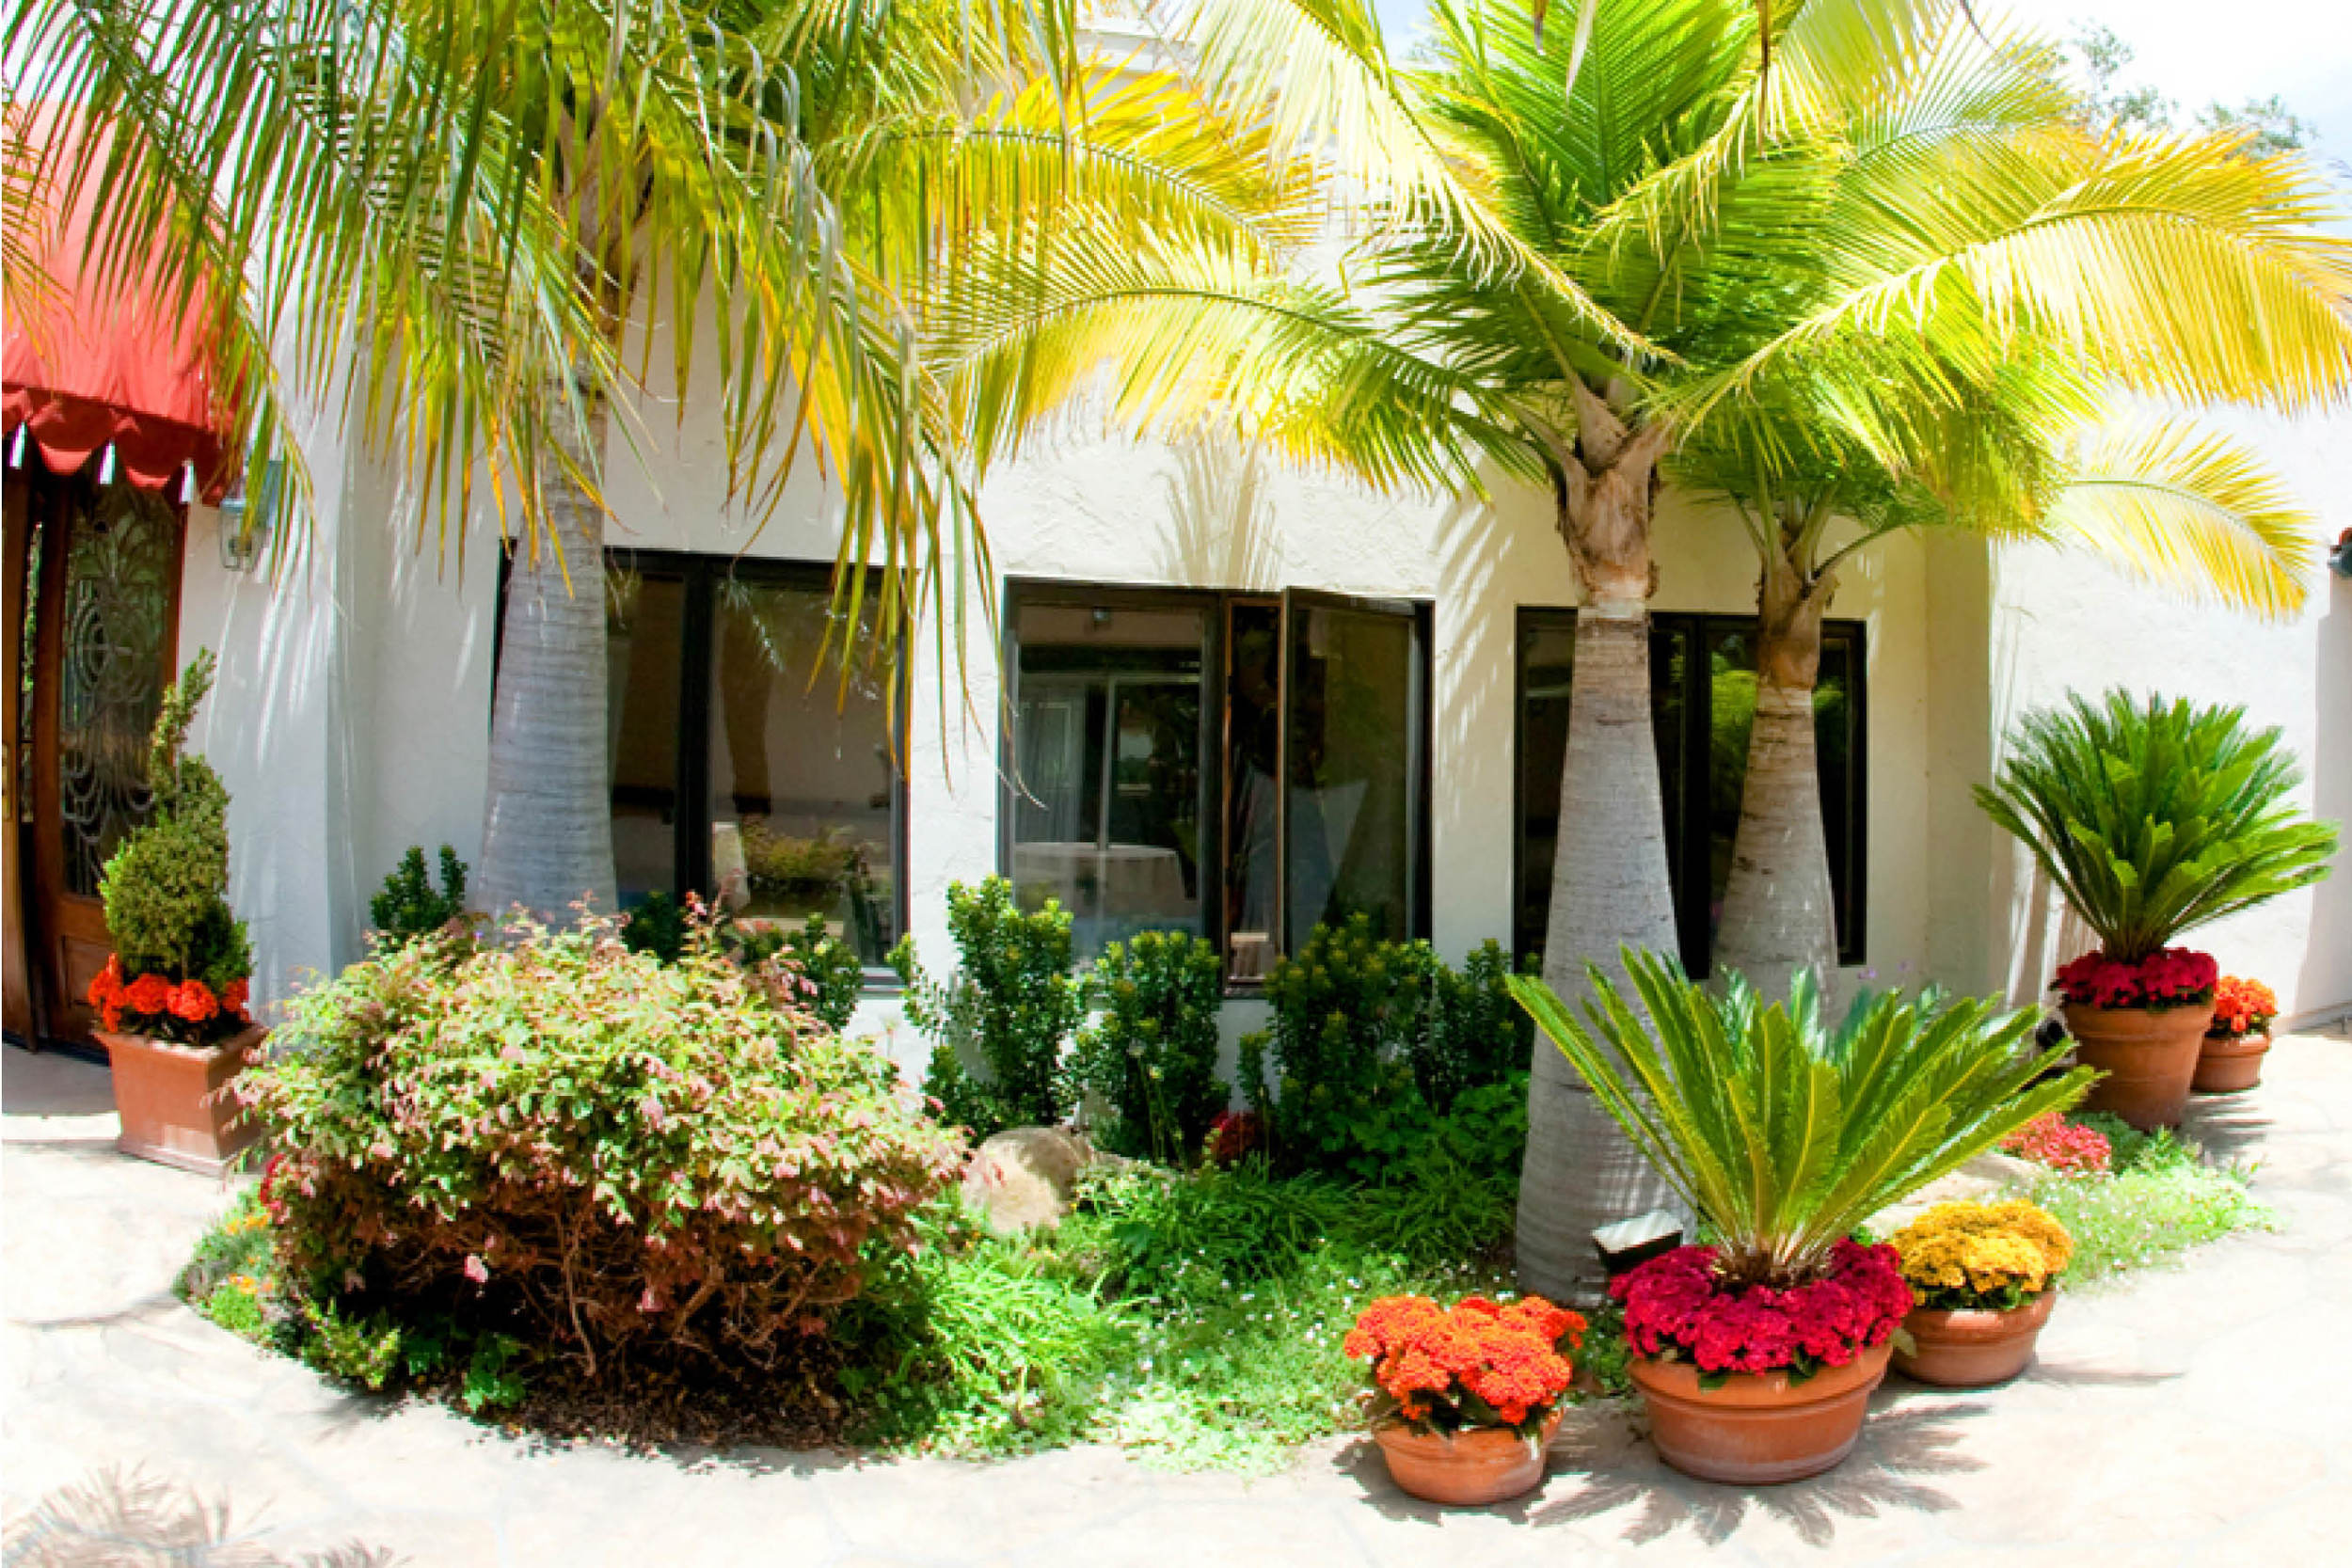 the-village-gardener-home-staging-plants-patio-decor-maintenance-interior-orchids-santa-barbara-carpinteria-losangeles-pasadena-santaynez  (6).jpg